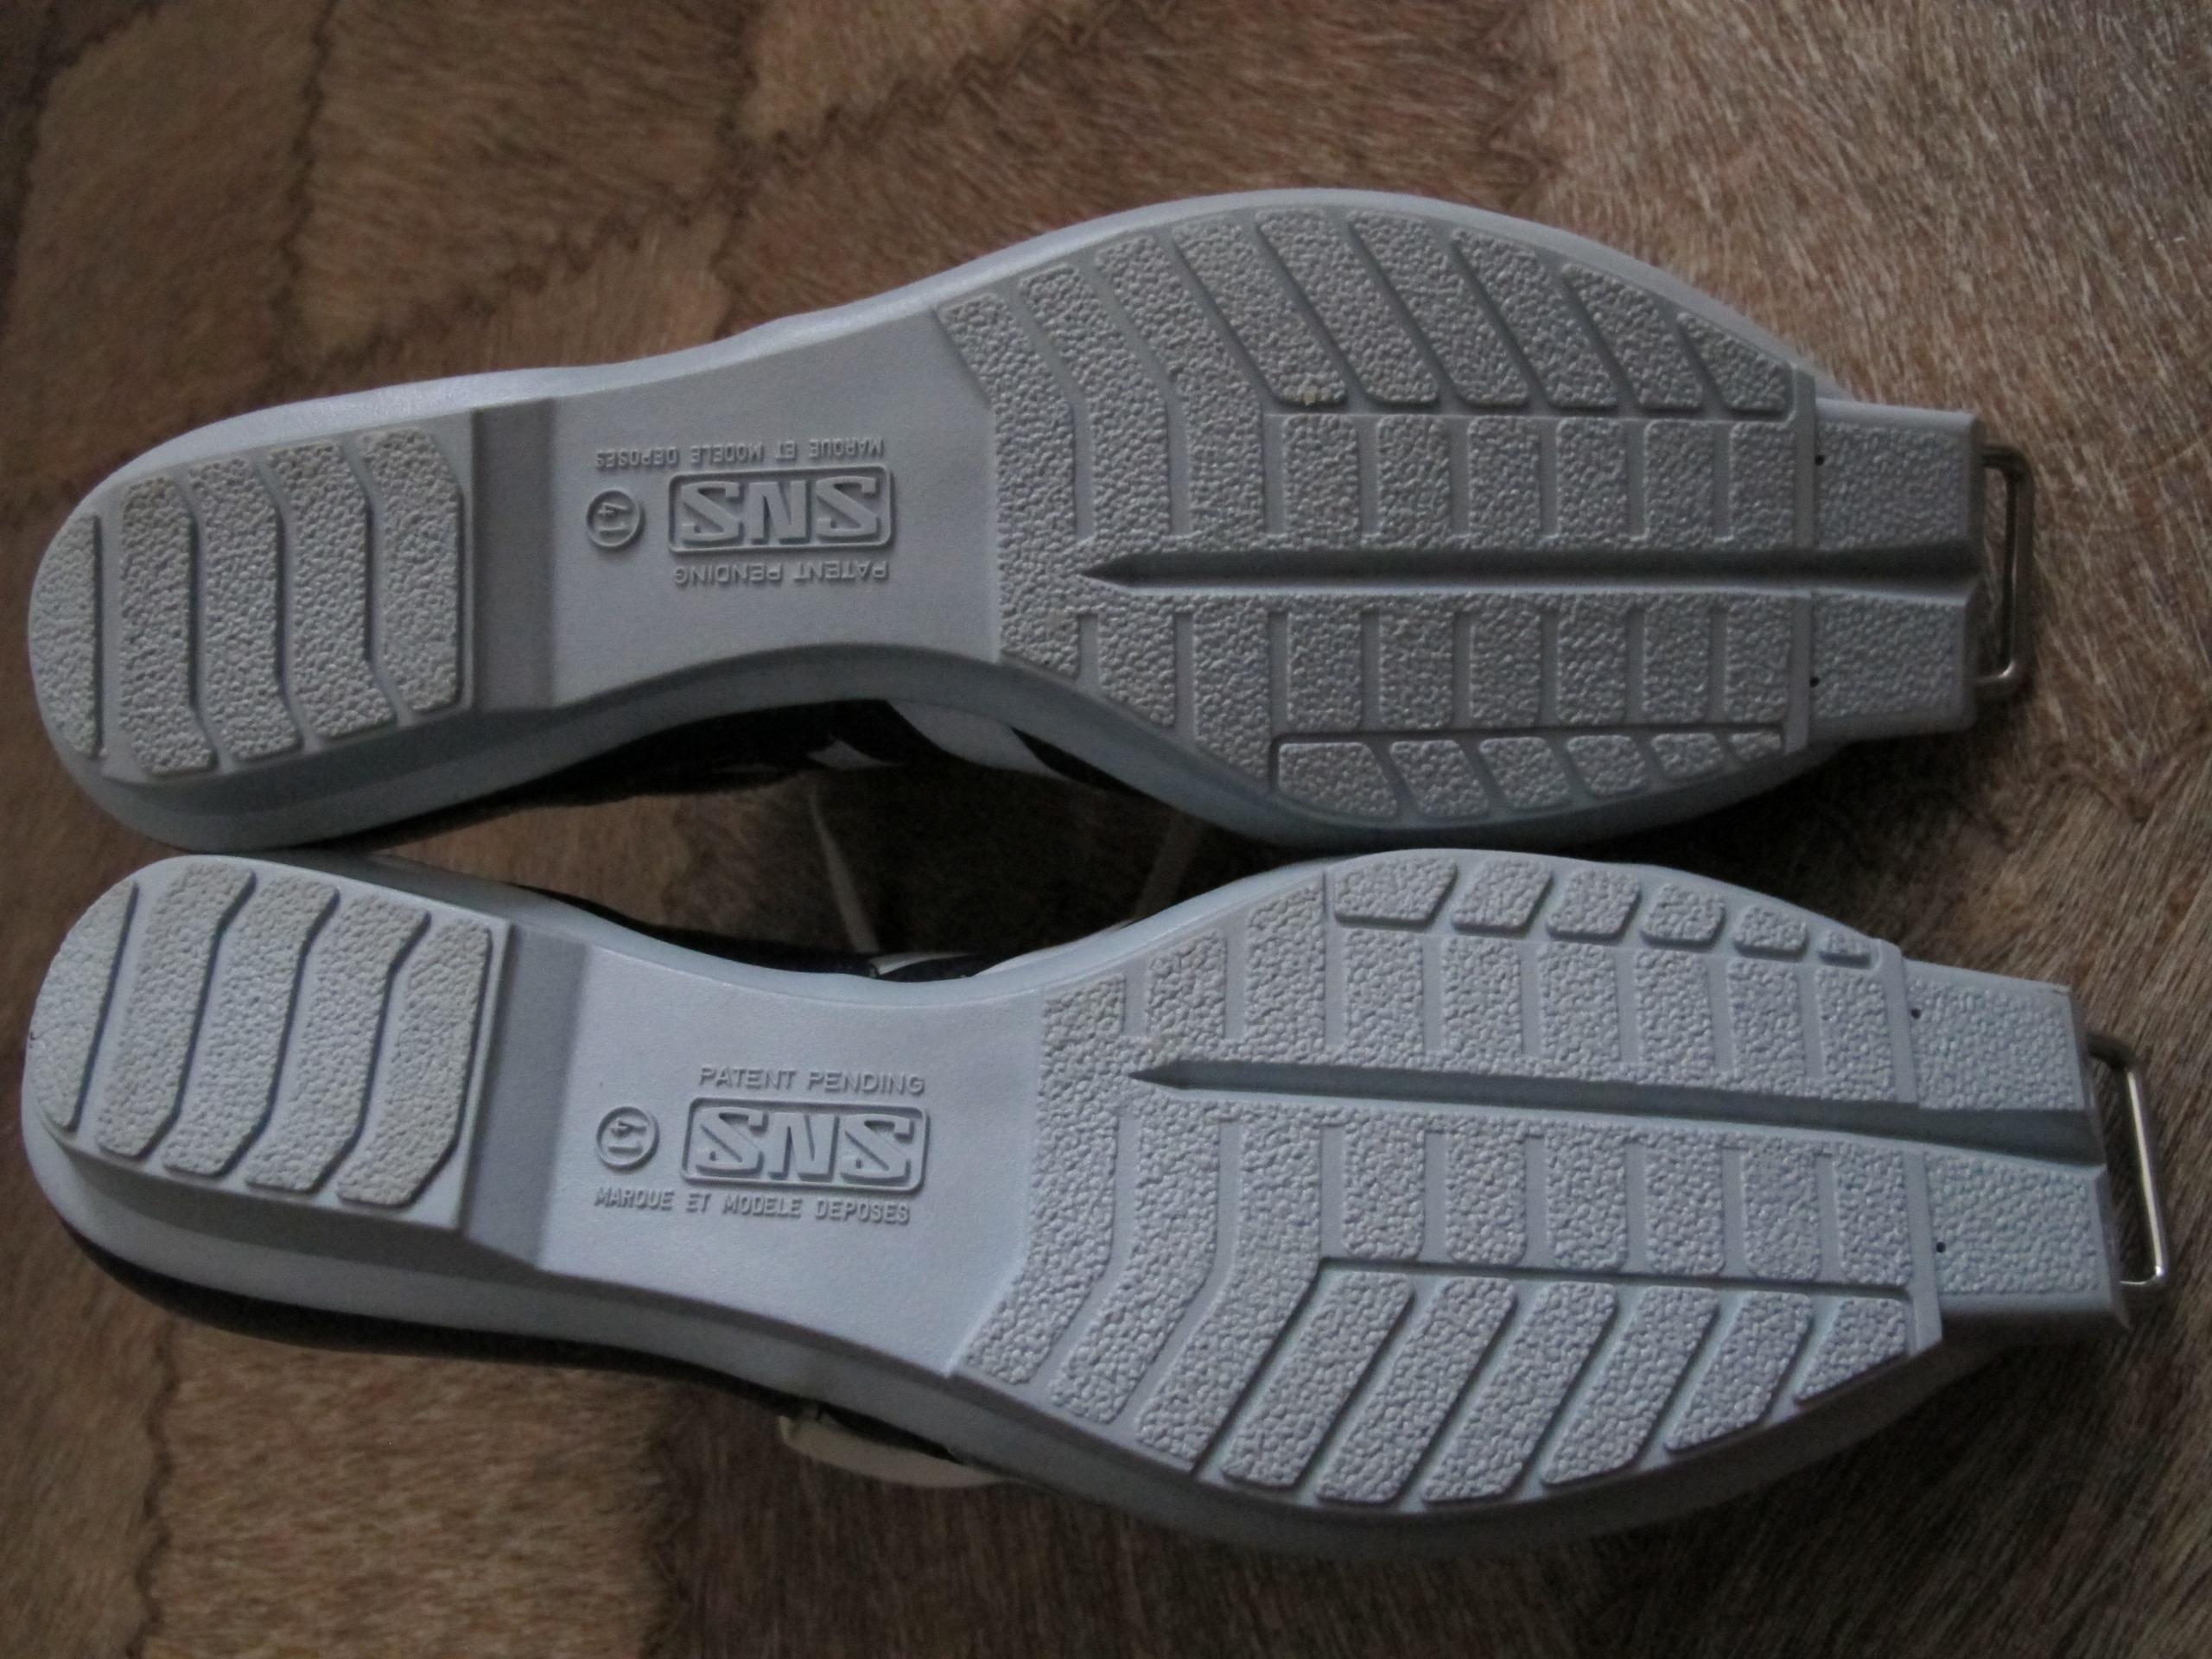 Ботинки для беговых лыж Каталог Триал-Спорт